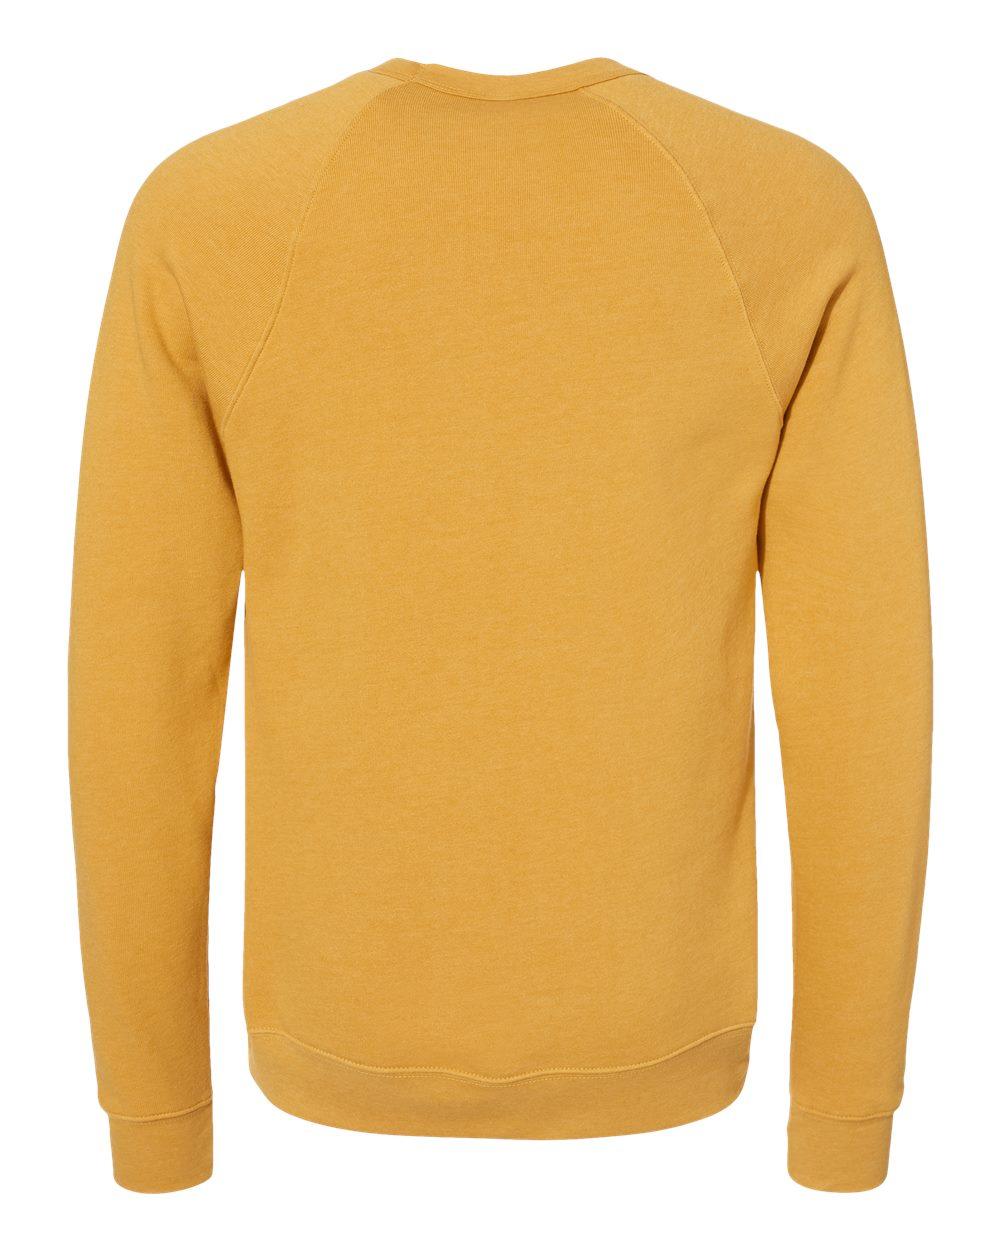 Bella-Canvas-Unisex-Sponge-Fleece-Crewneck-Sweatshirt-Top-Blank-3901-up-to-2XL thumbnail 38